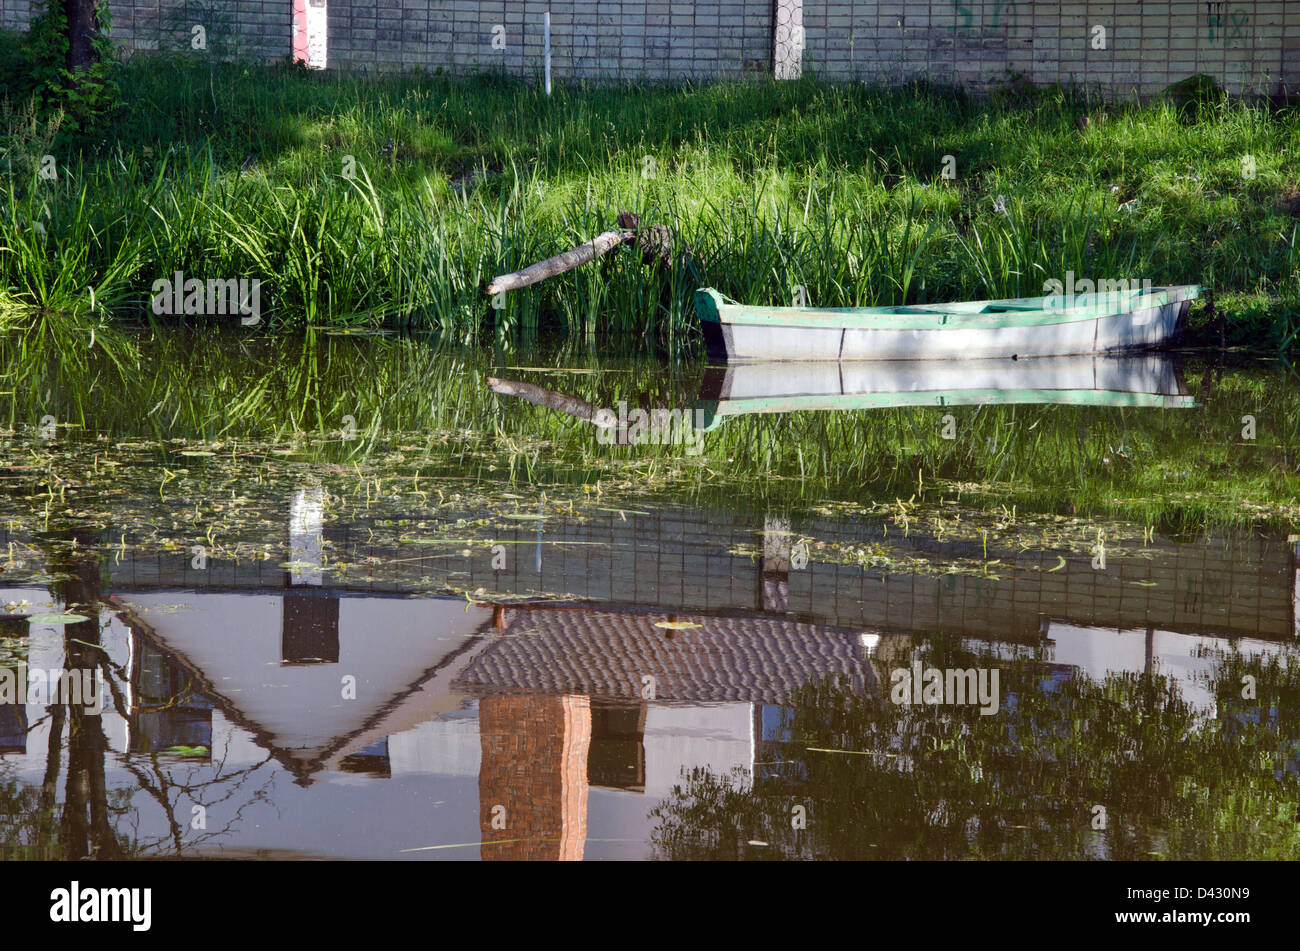 zeile holzboot schwimmer in der n he von green river ufer. Black Bedroom Furniture Sets. Home Design Ideas